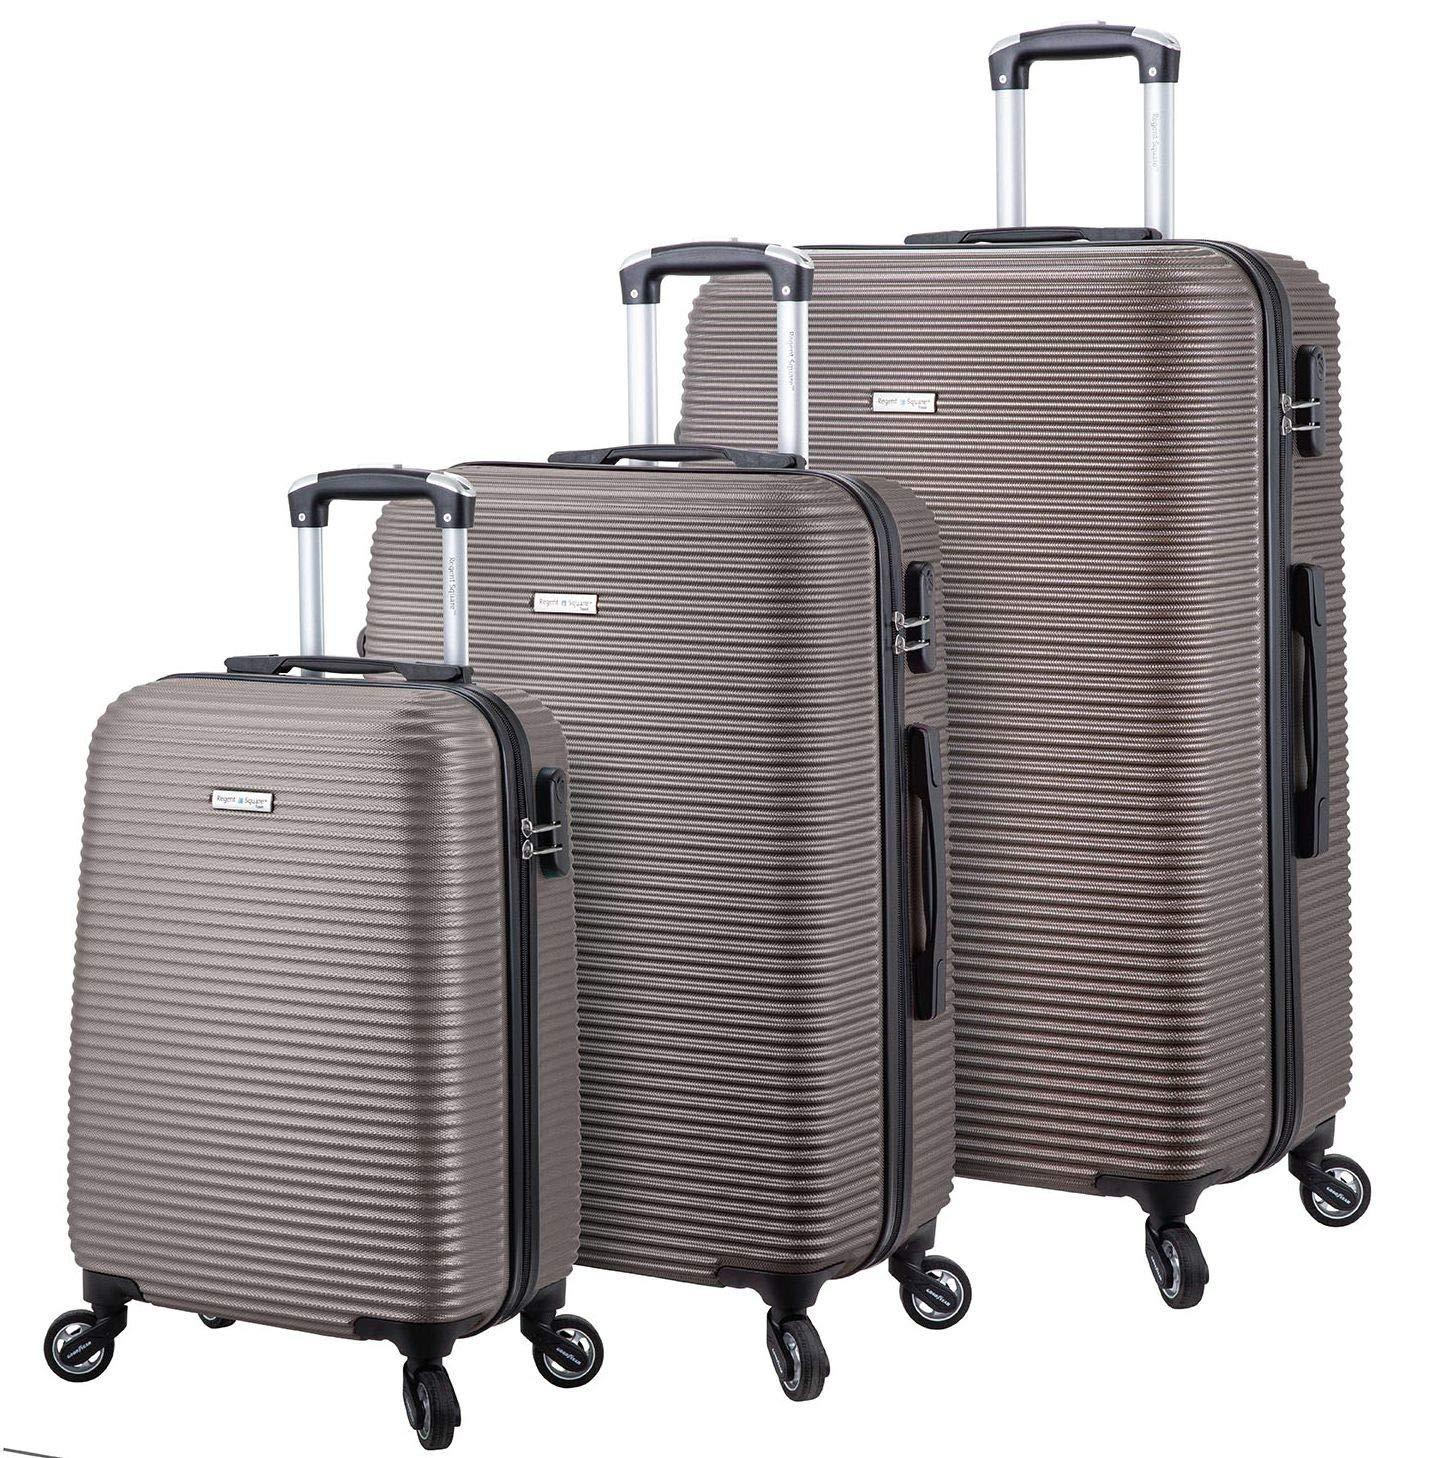 Regent Square Travel - Luggage Set Anti-Scratch Texture Hard Shell